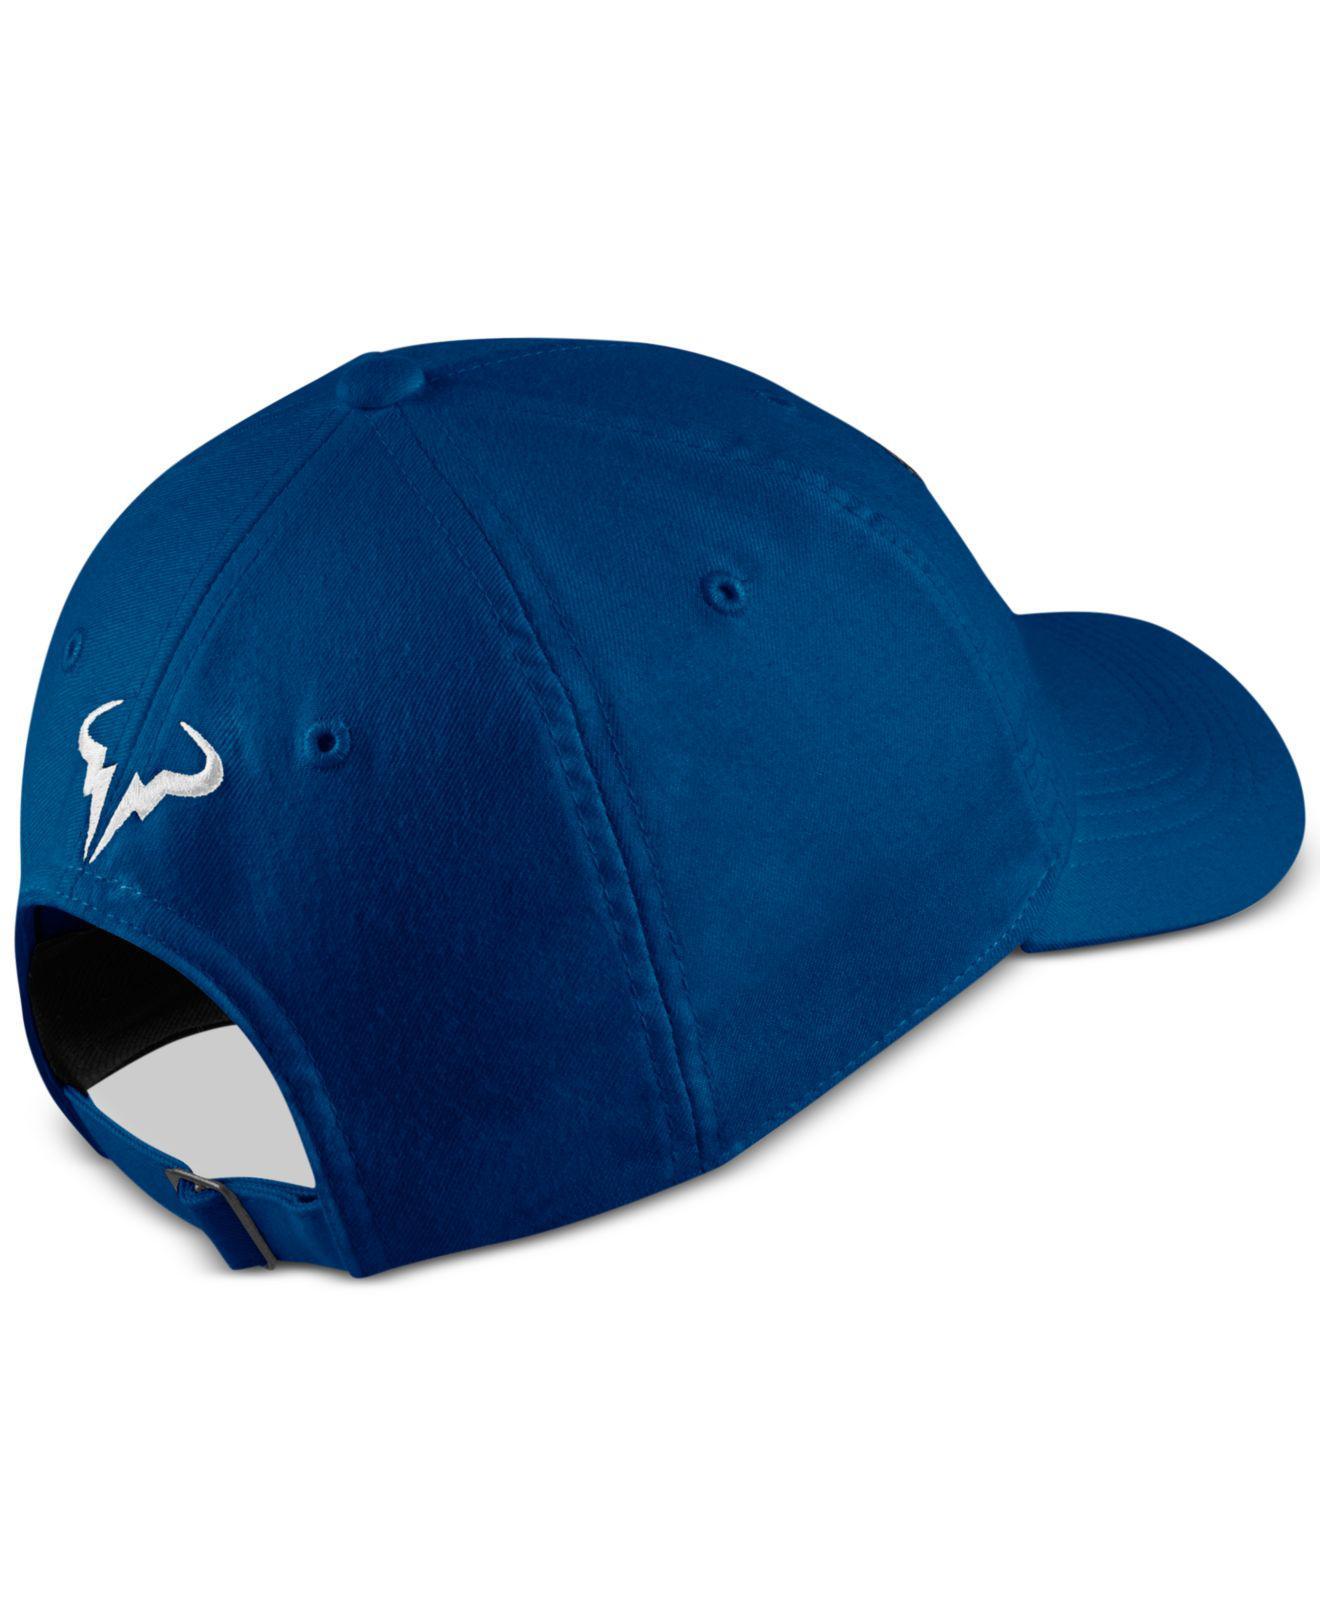 b5565c9c20f47 Lyst - Nike Court Aerobill Rafa Tennis Hat in Blue for Men